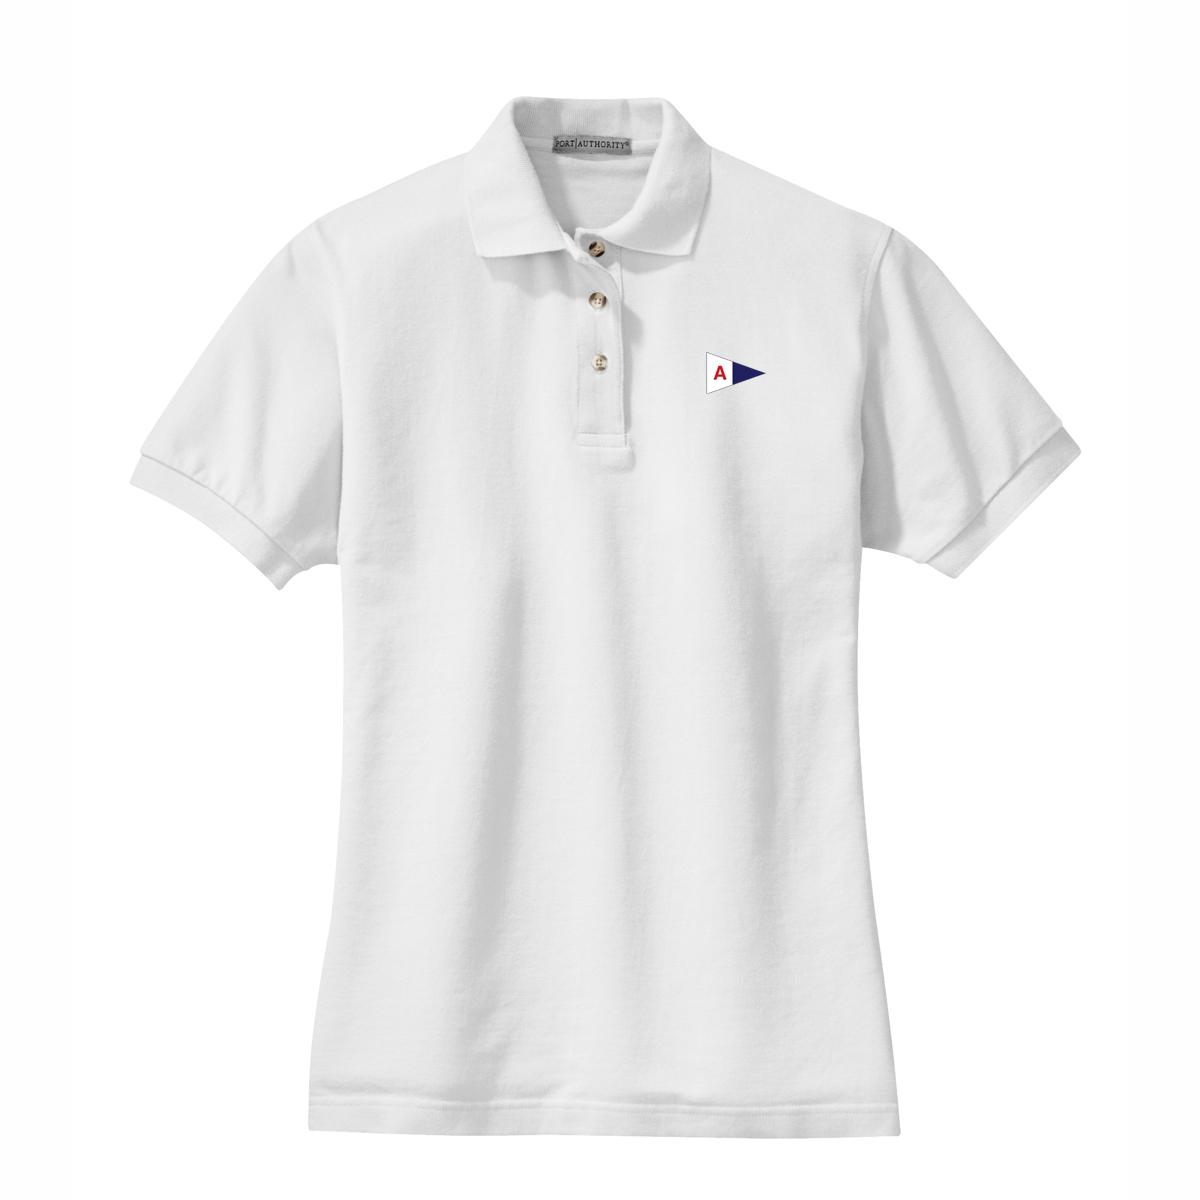 Arundel Yacht Club - Women's Cotton Polo